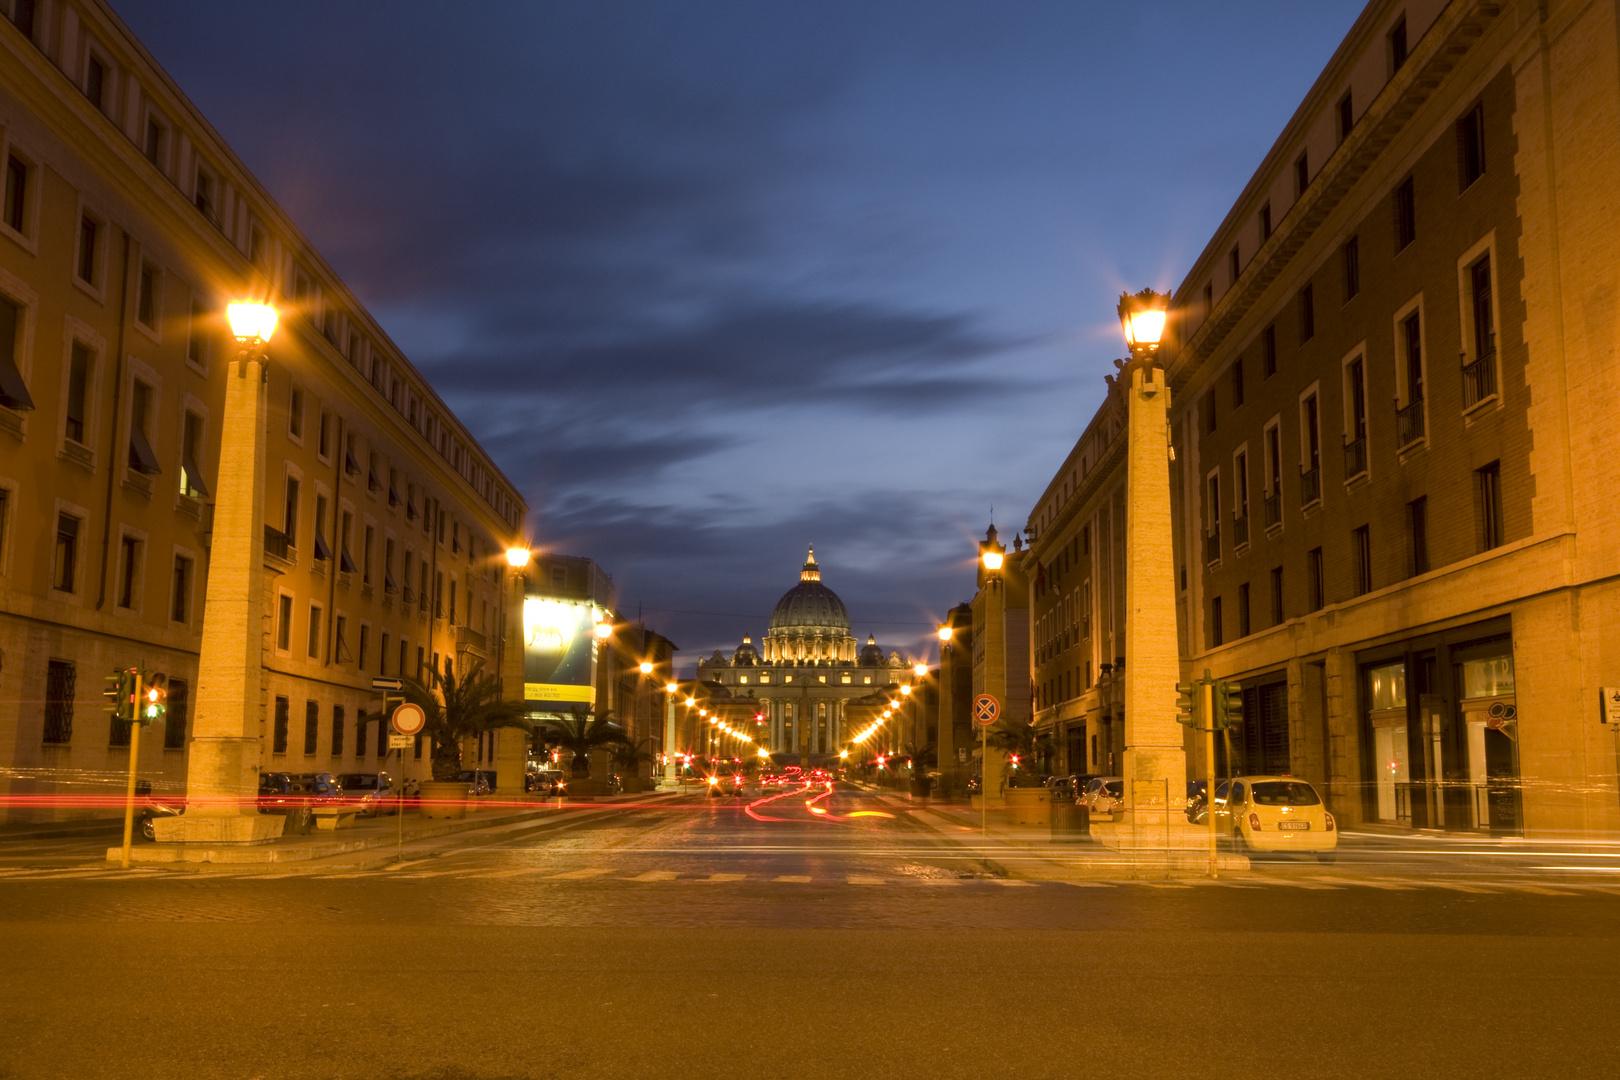 Weg zum Palast